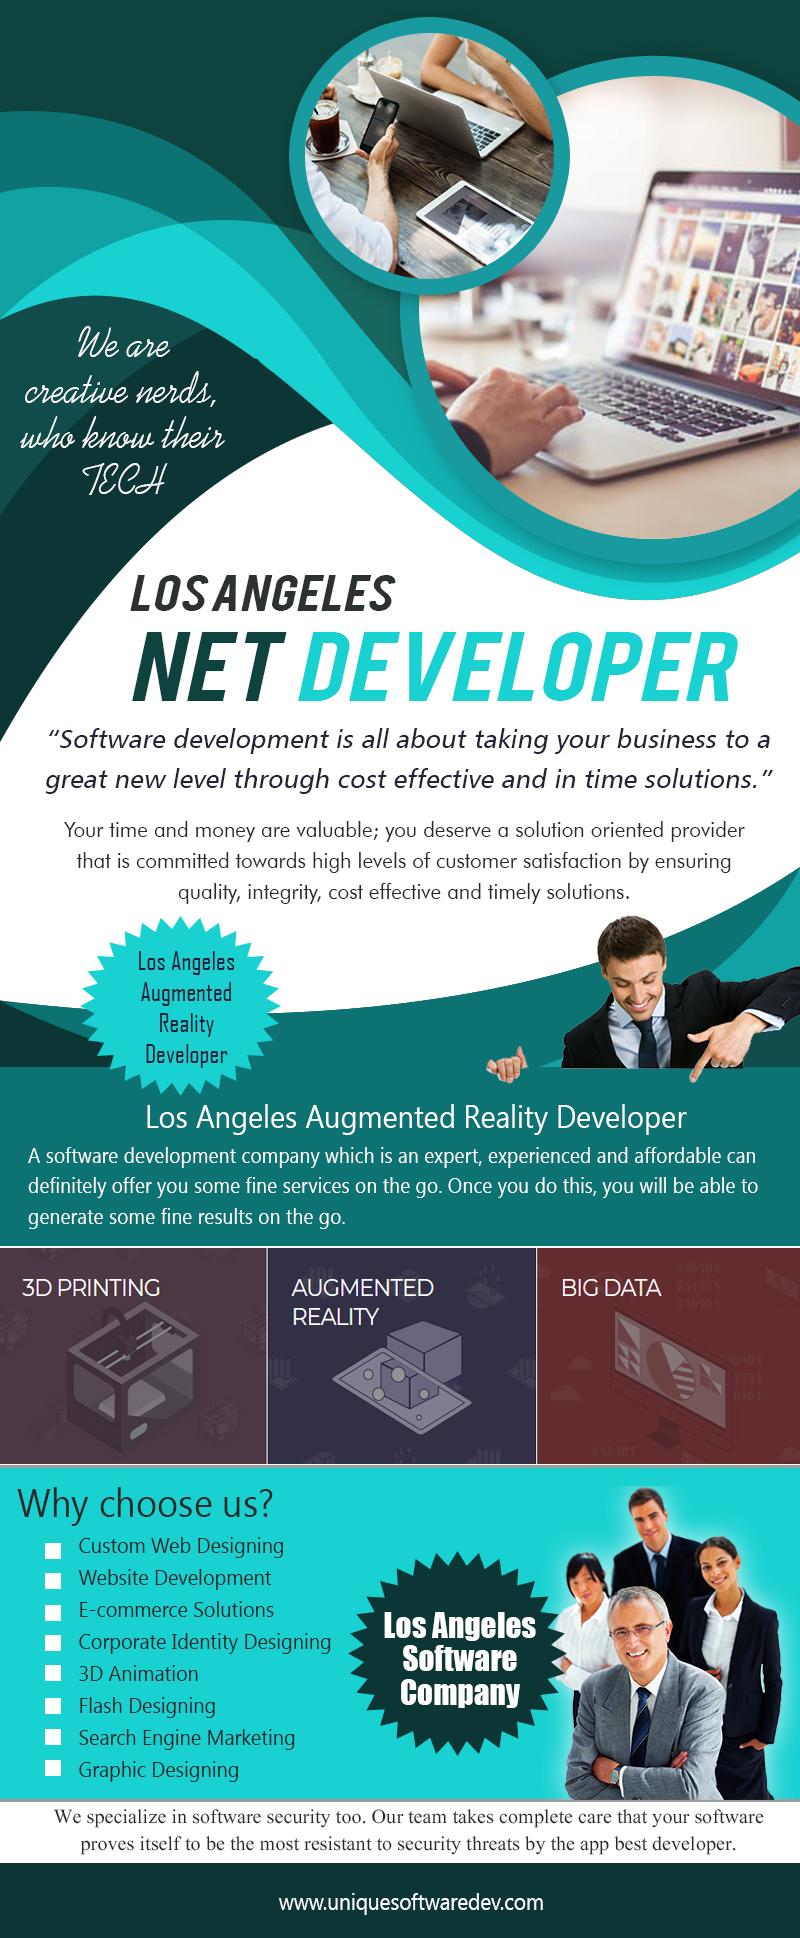 Los Angeles Net Developer